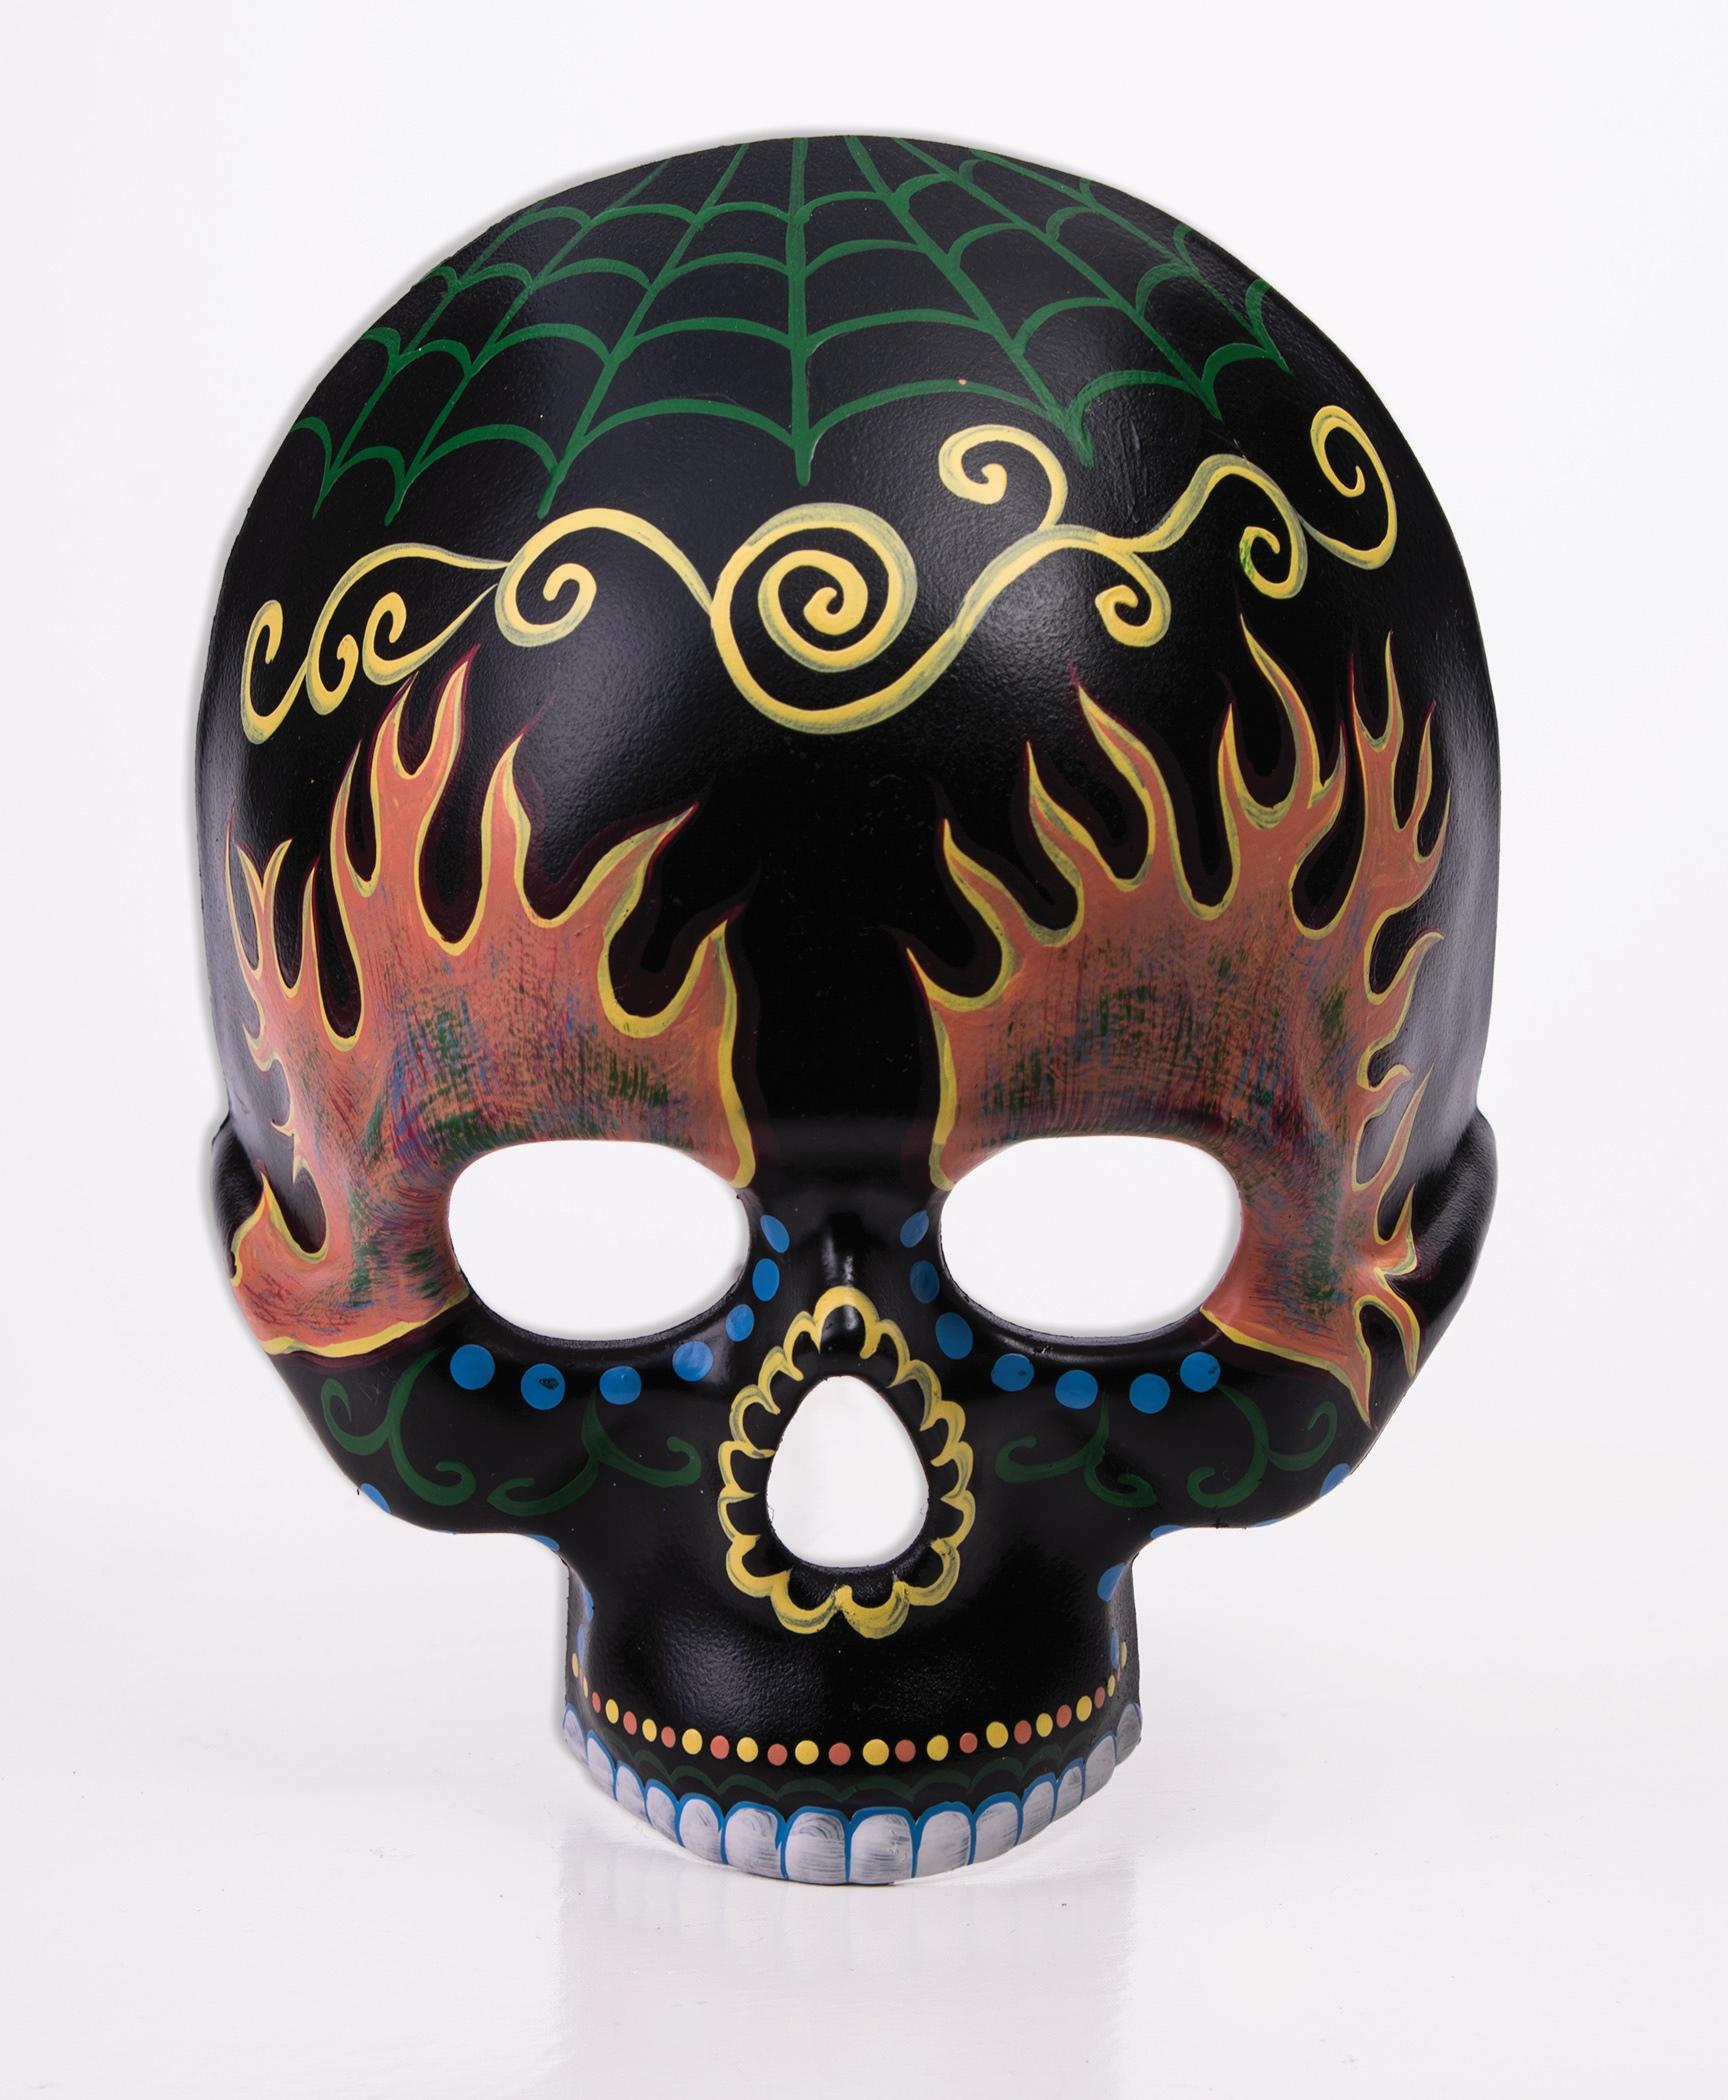 Day Of The Dead Black Sugar Skull Mask Flames Masquerade Costume